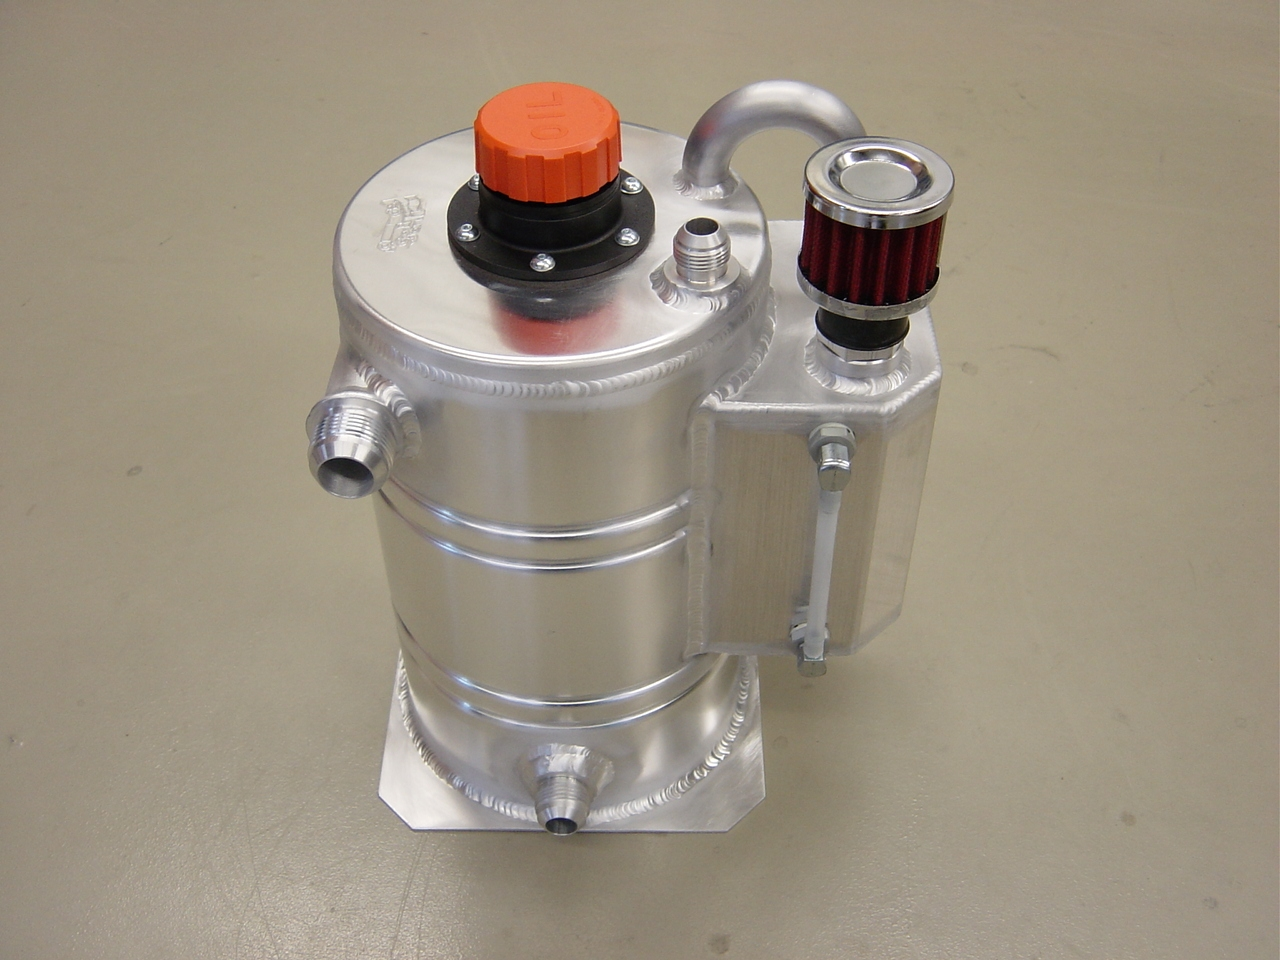 Dry-sump tank 6 liter speciaal - L - Dash 16-0